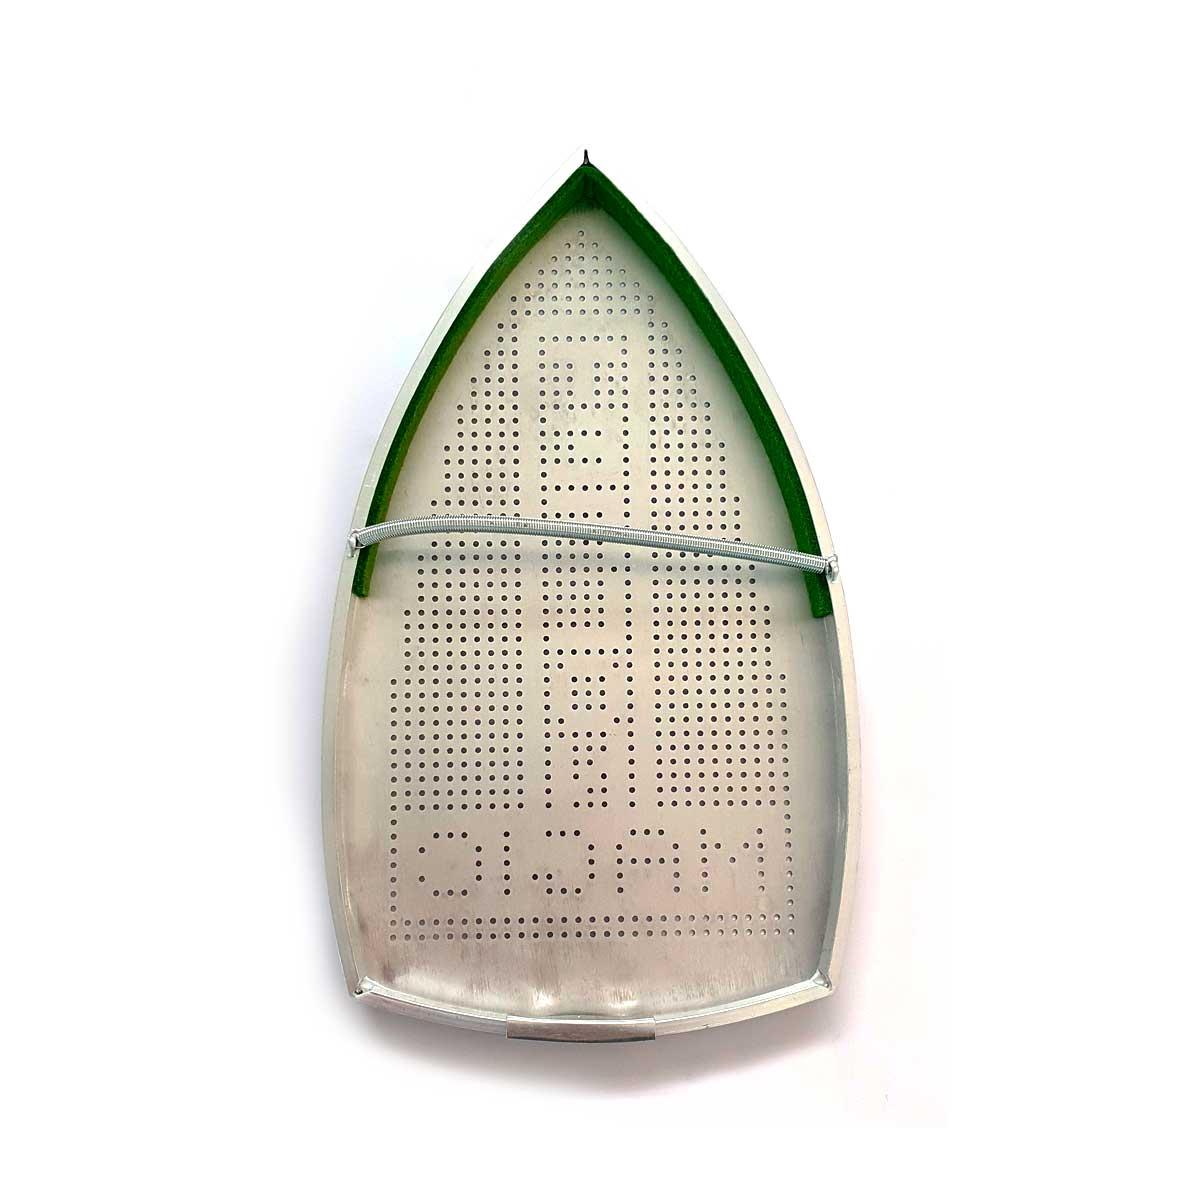 Sapata Anti Brilho Para Ferro Industrial 2,5 KG  - Pavvia Agulhas e Peças